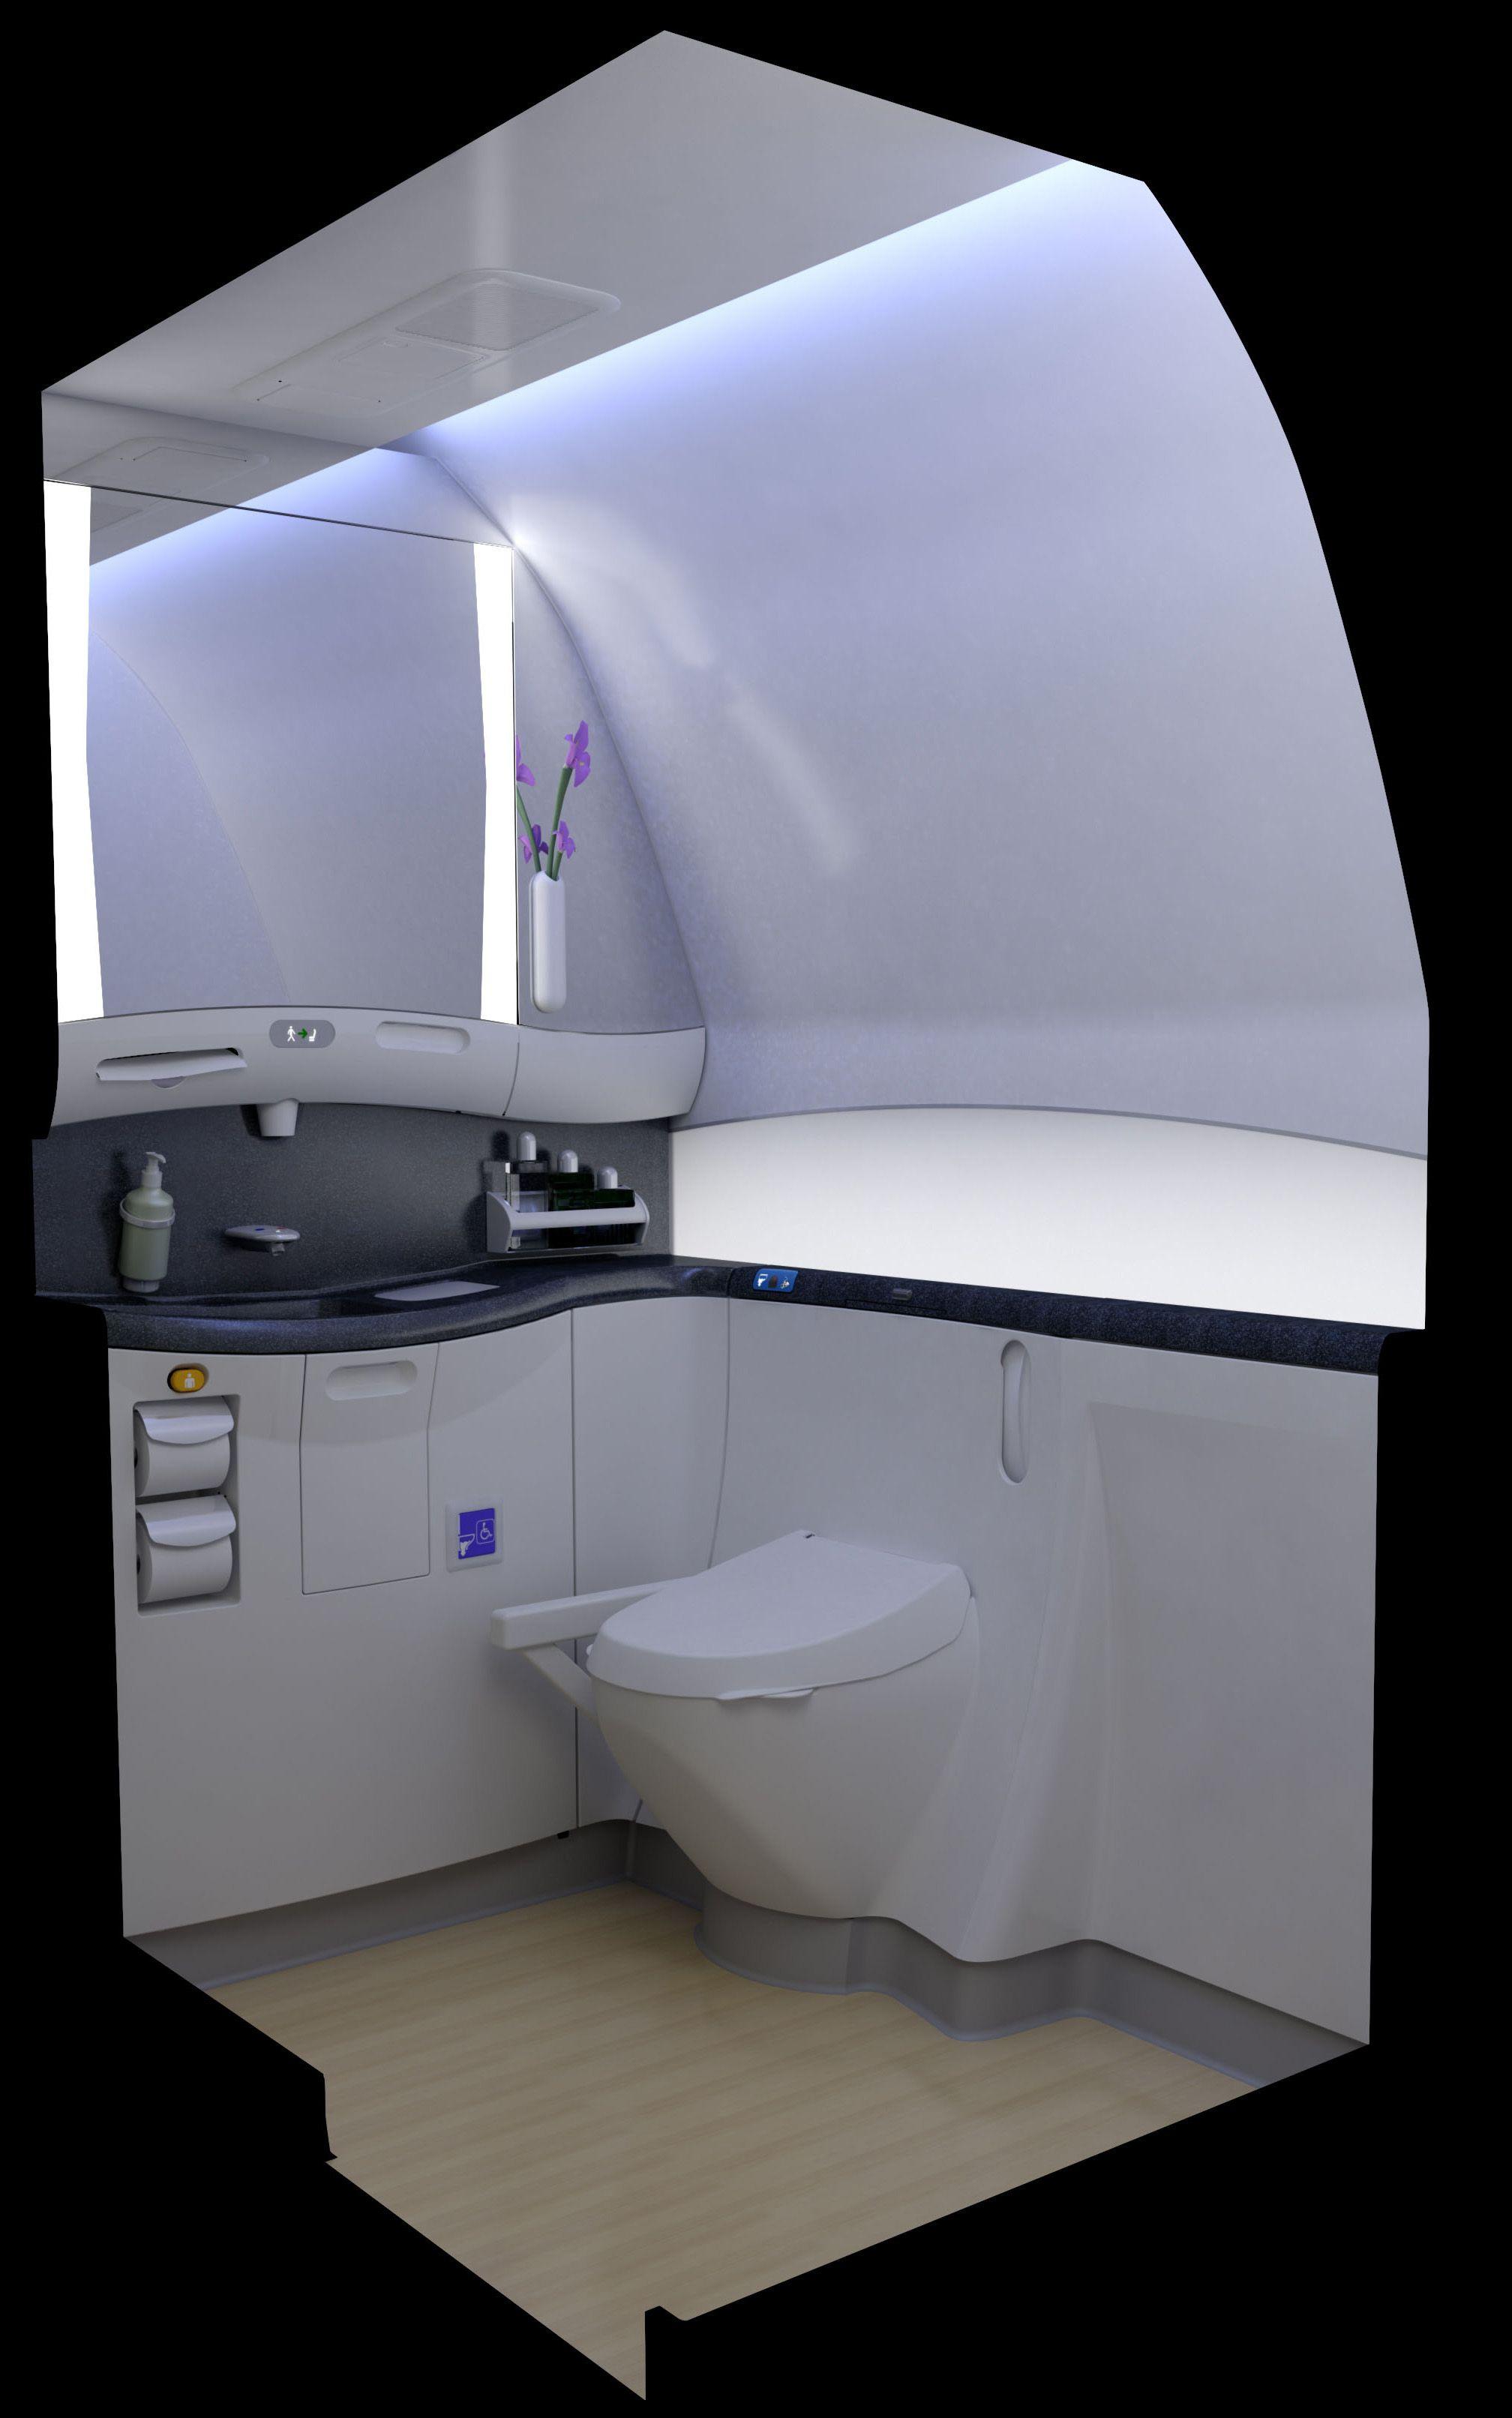 Gulfstream g650 interior bedroom kg 픽셀  lavatory  pinterest  architecture